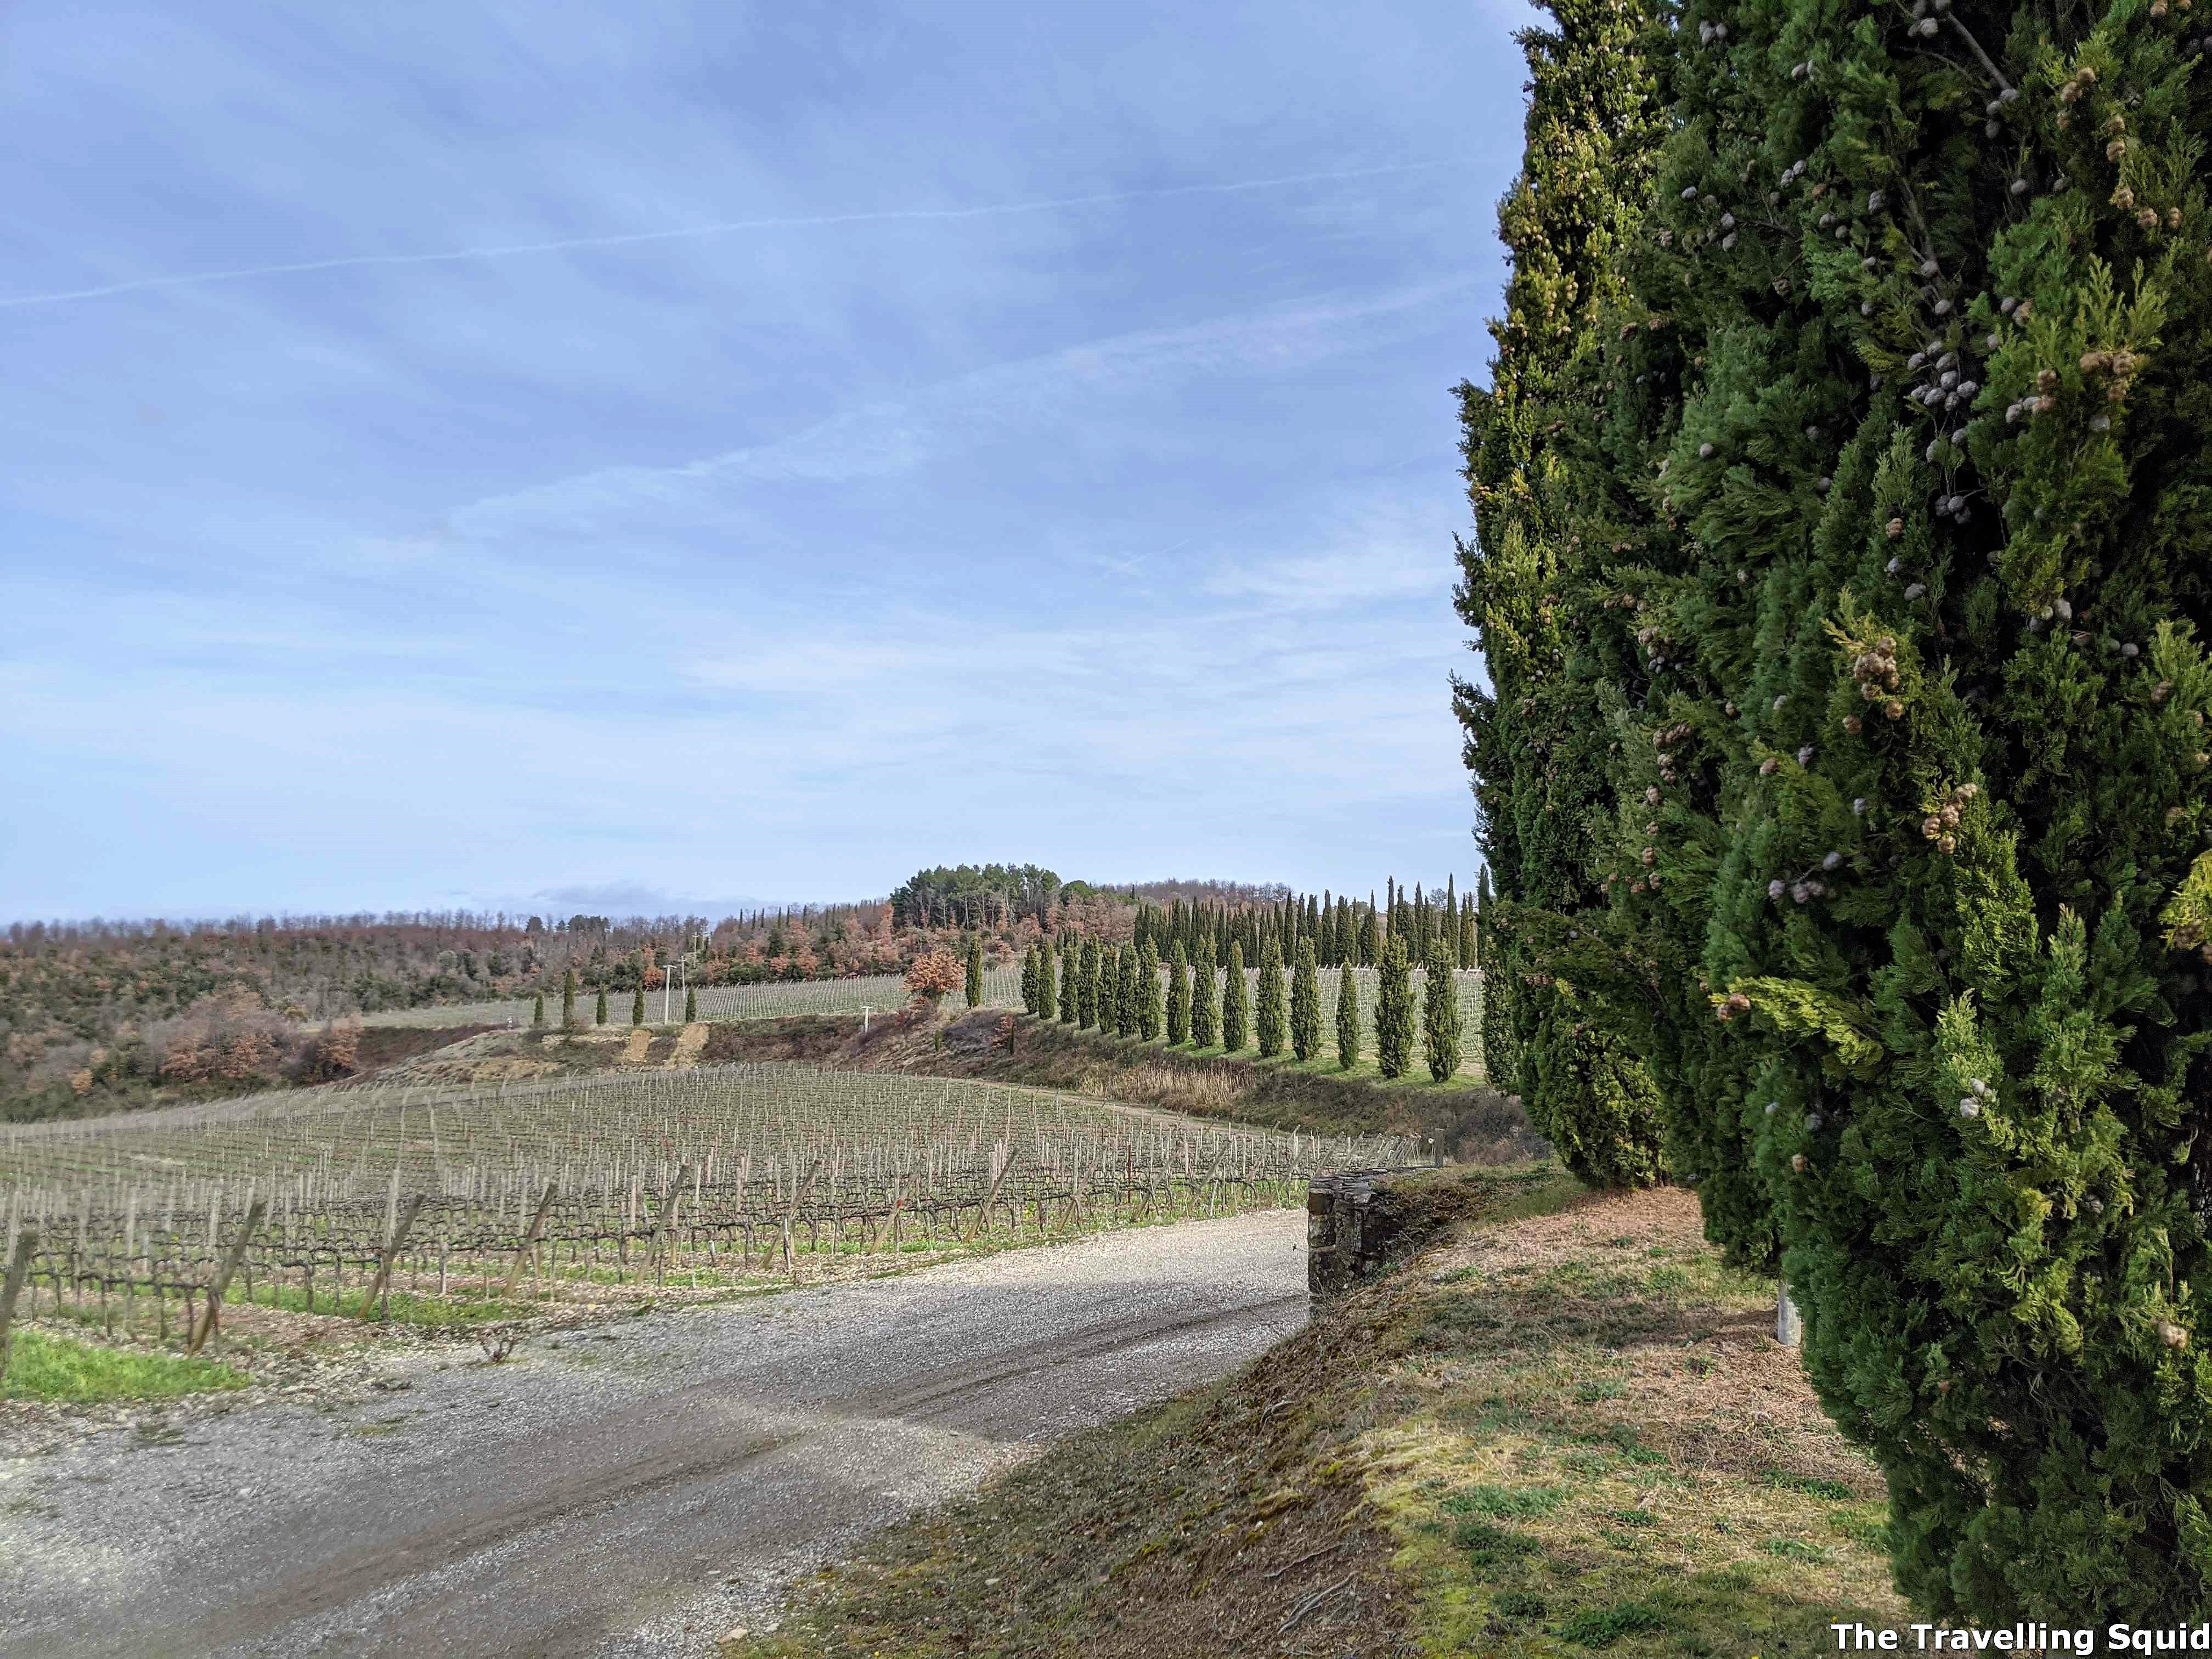 vineyards to visit in Montalcino Italy Poggio Antico